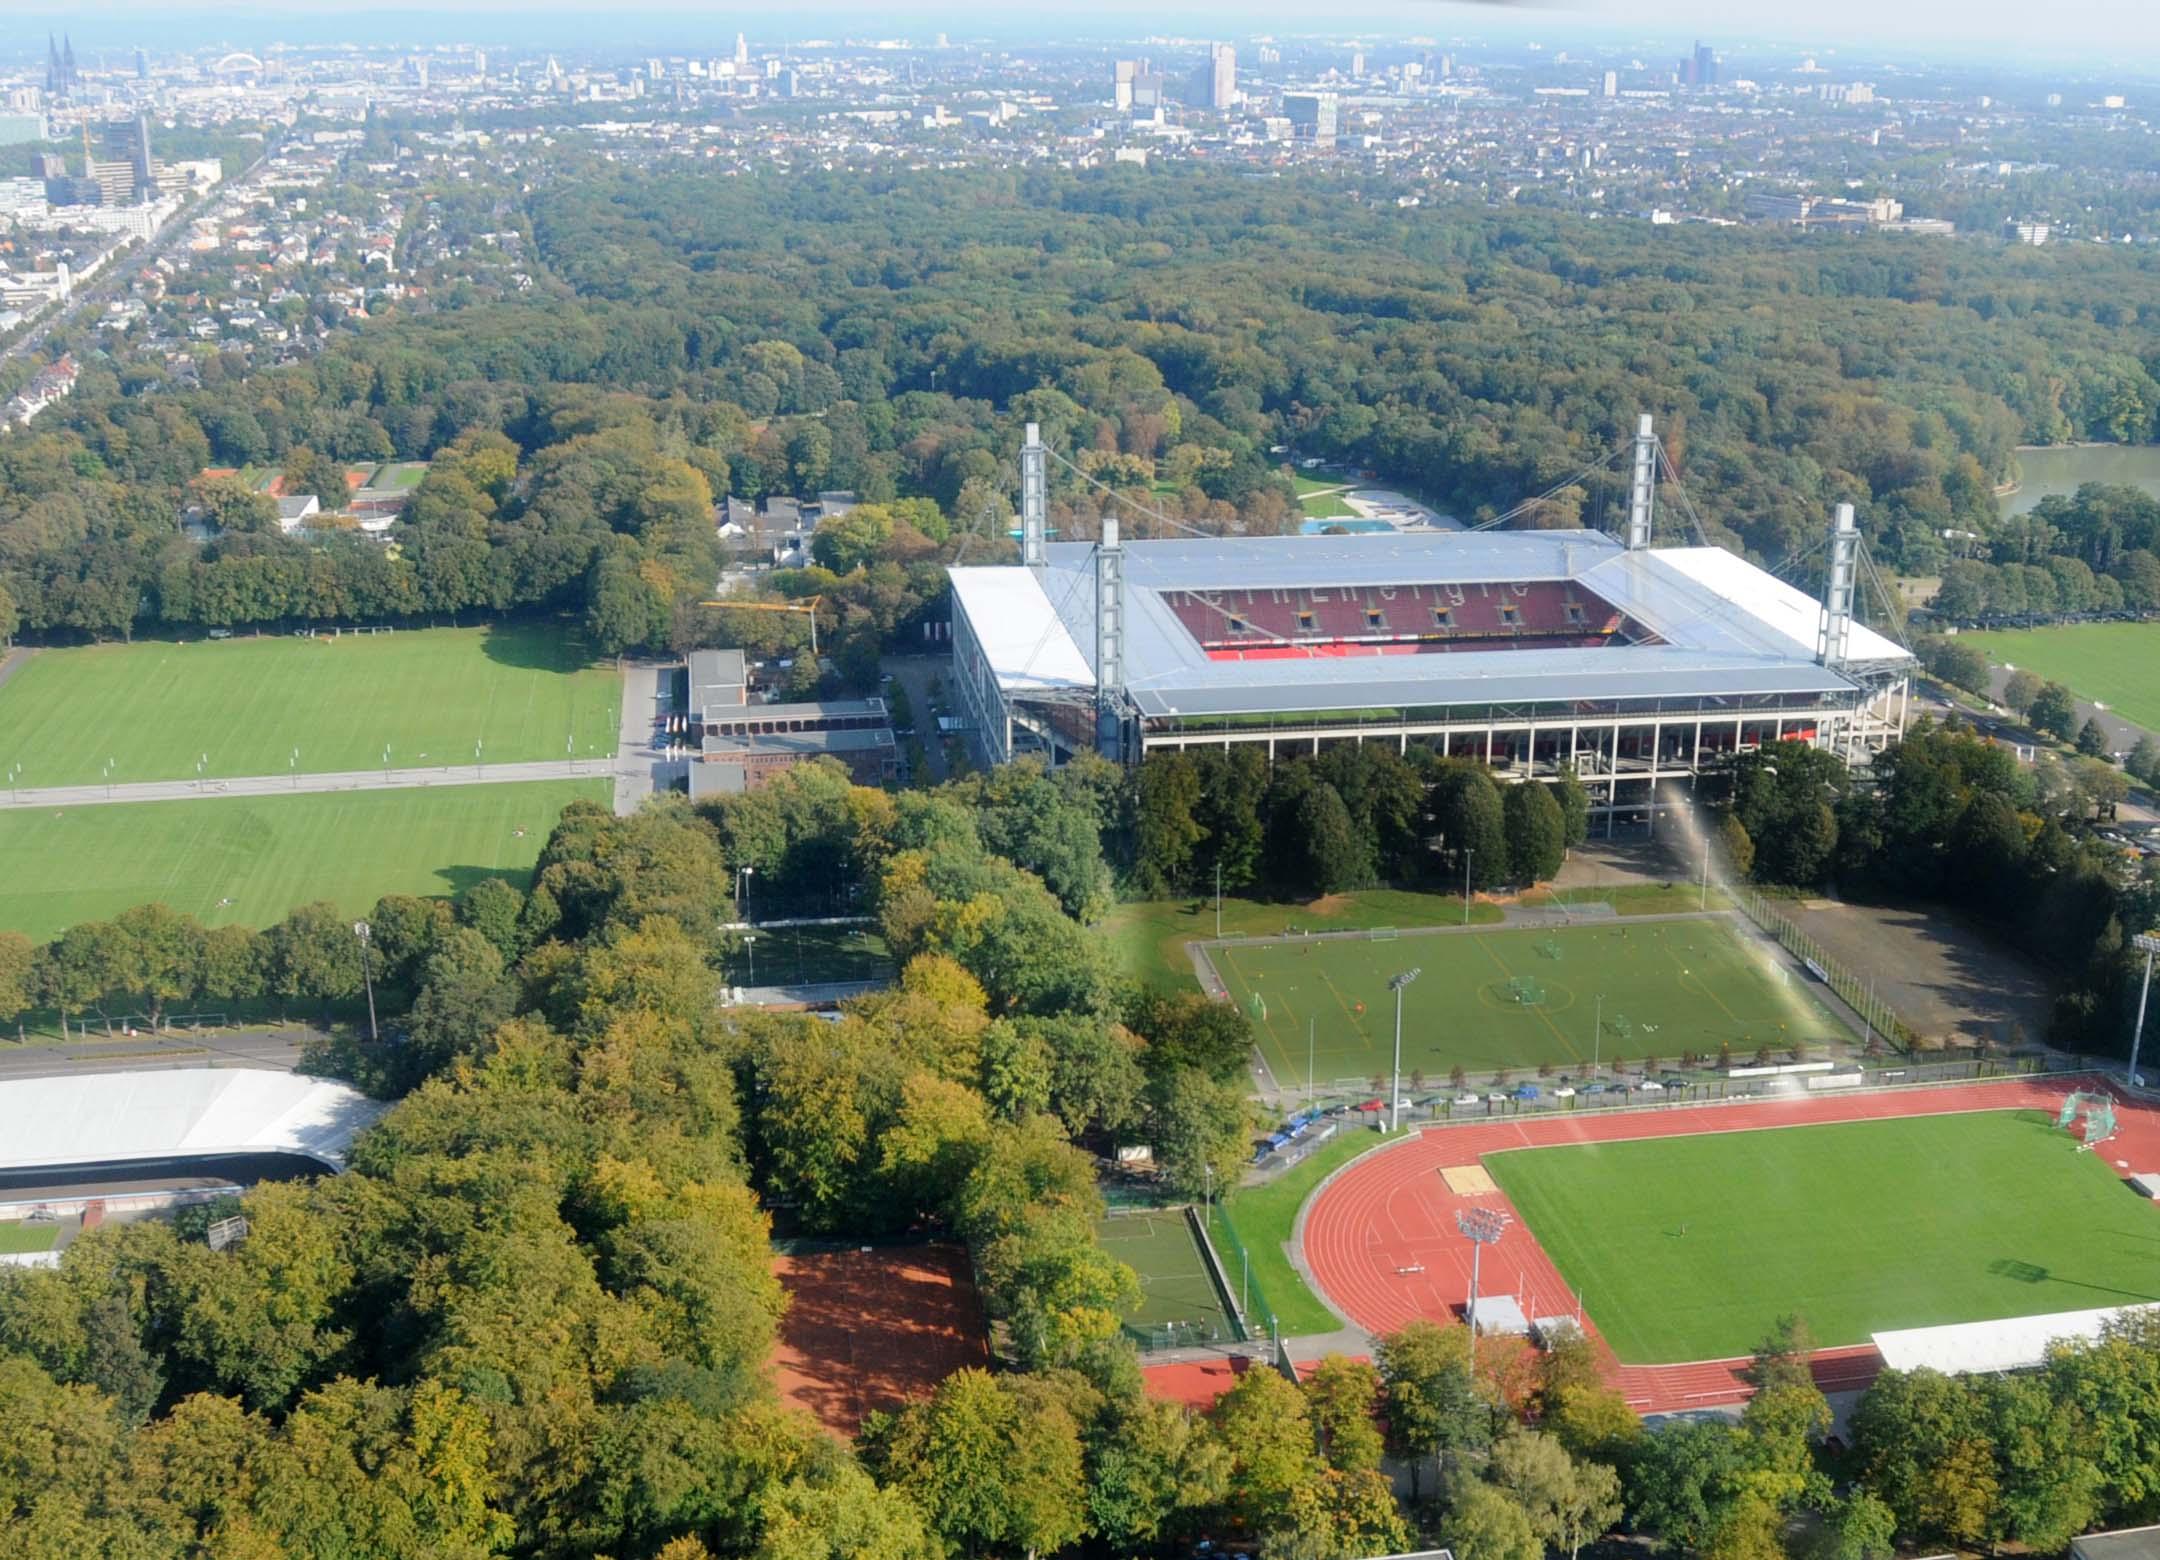 Sportpark Müngersdorf